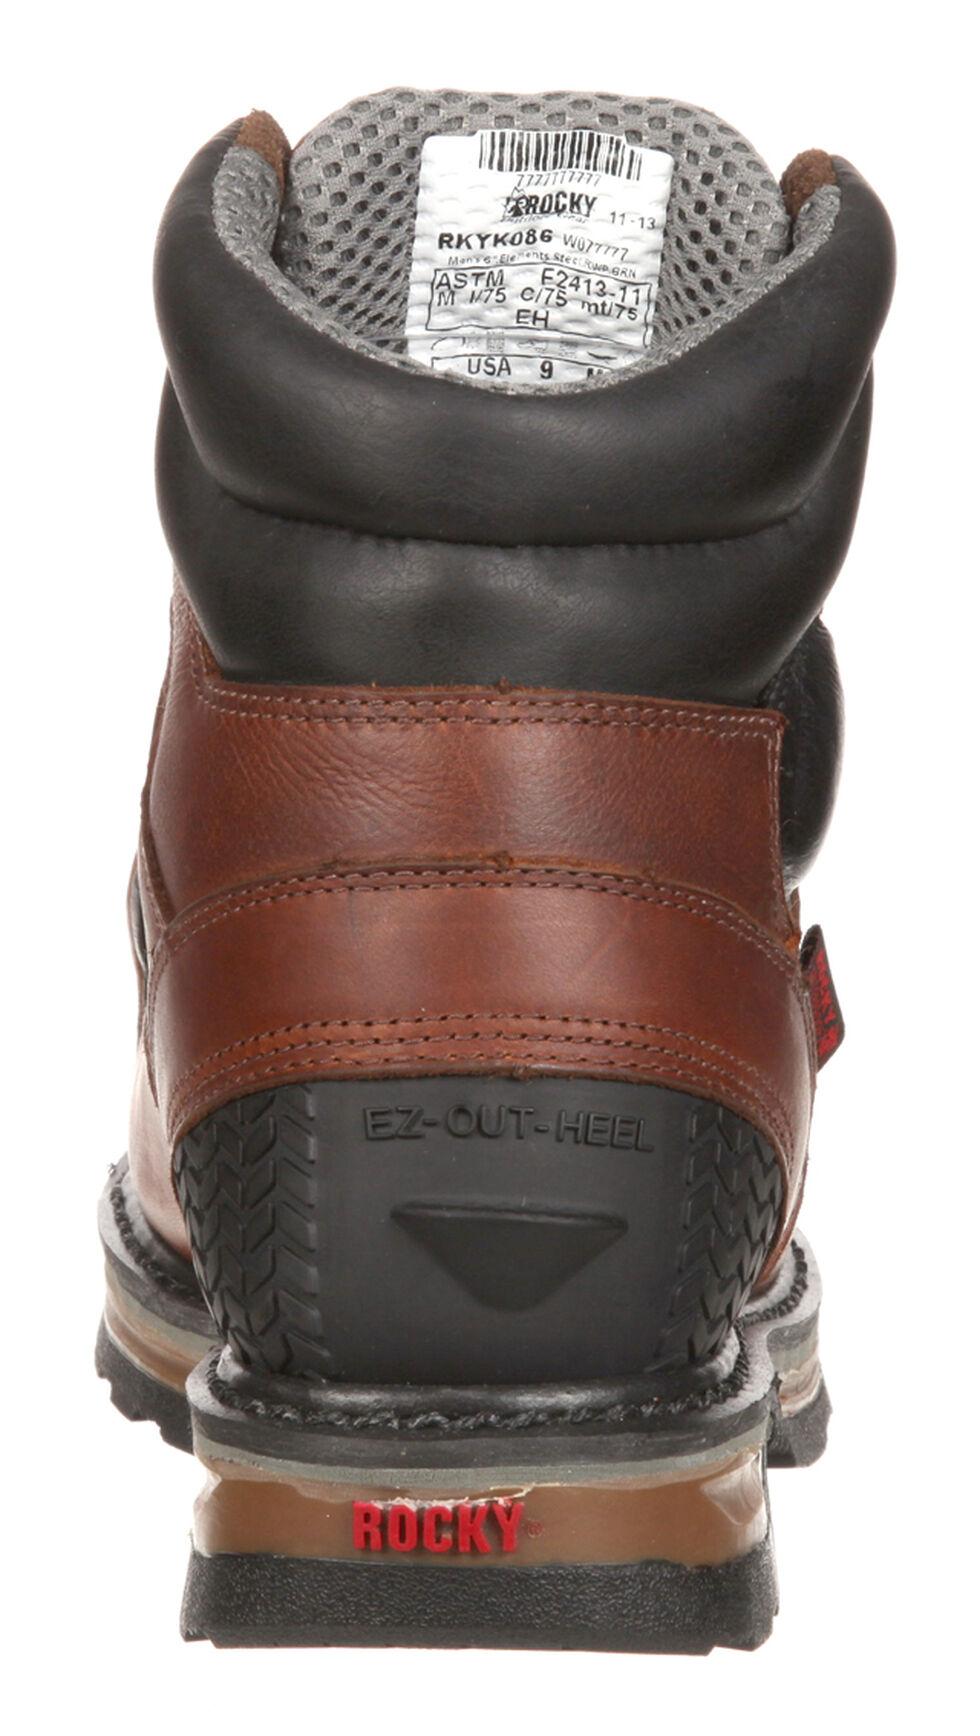 Rocky Elements Steel Waterproof Met Guard Work Boots - Safety Toe, Brown, hi-res